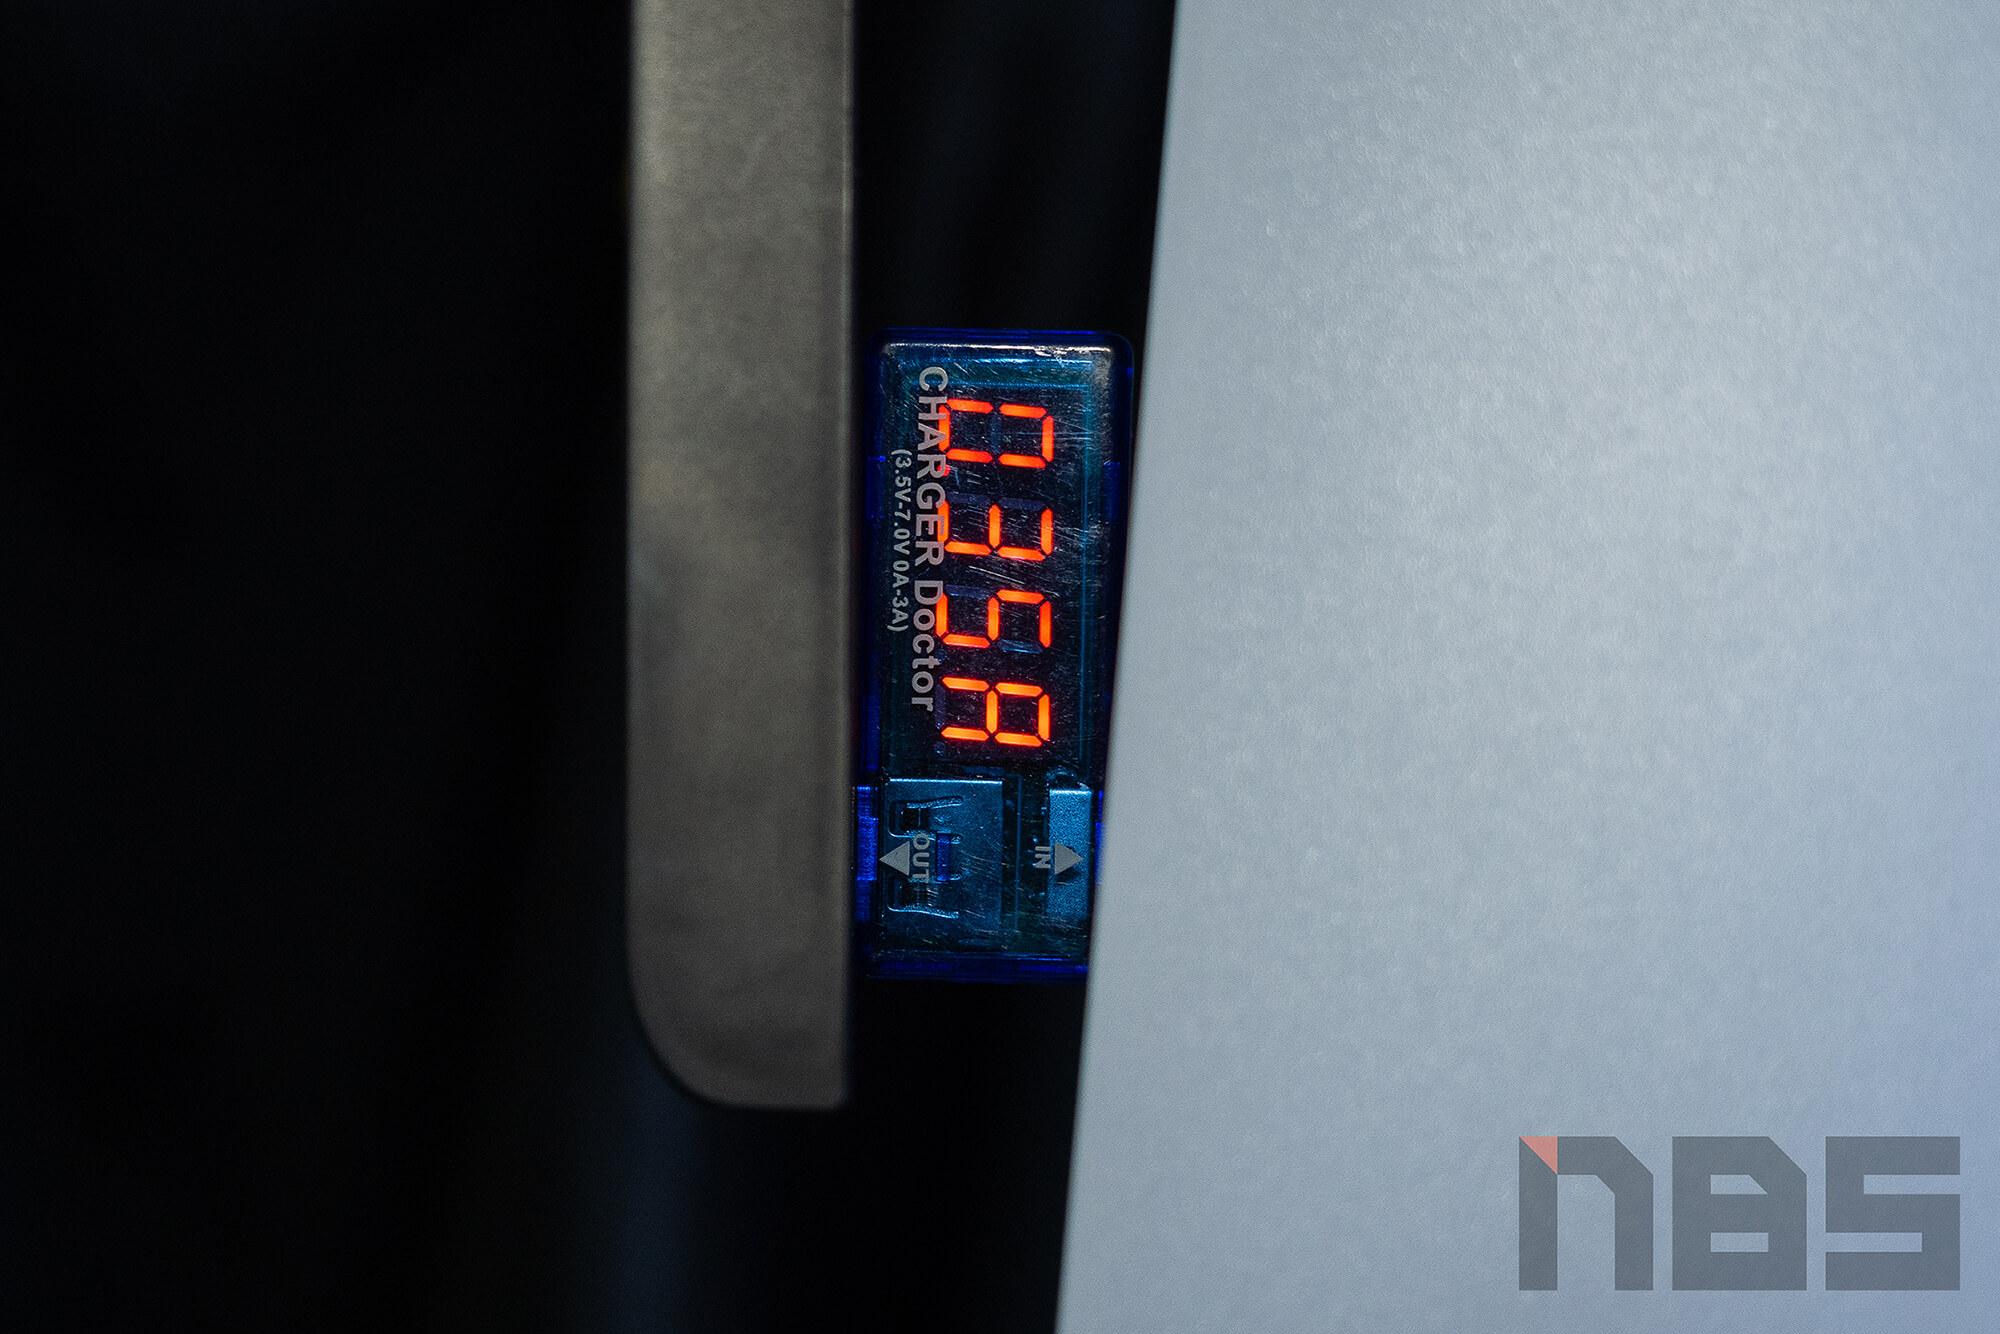 Review PS5 Fan NotebookSPEC 19